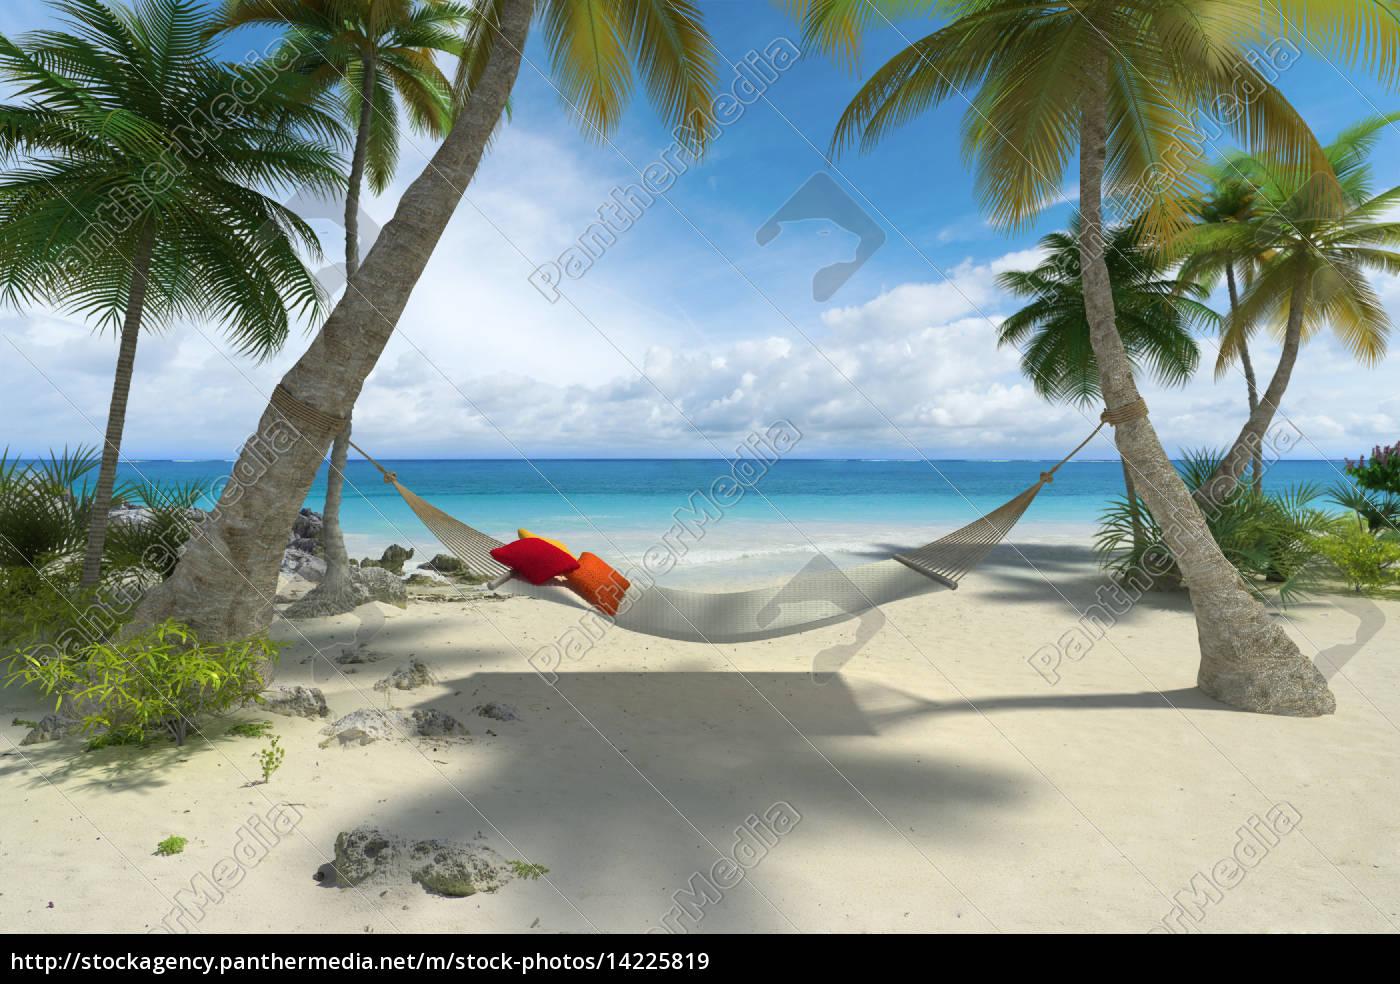 relaja, te, en, la, playa - 14225819